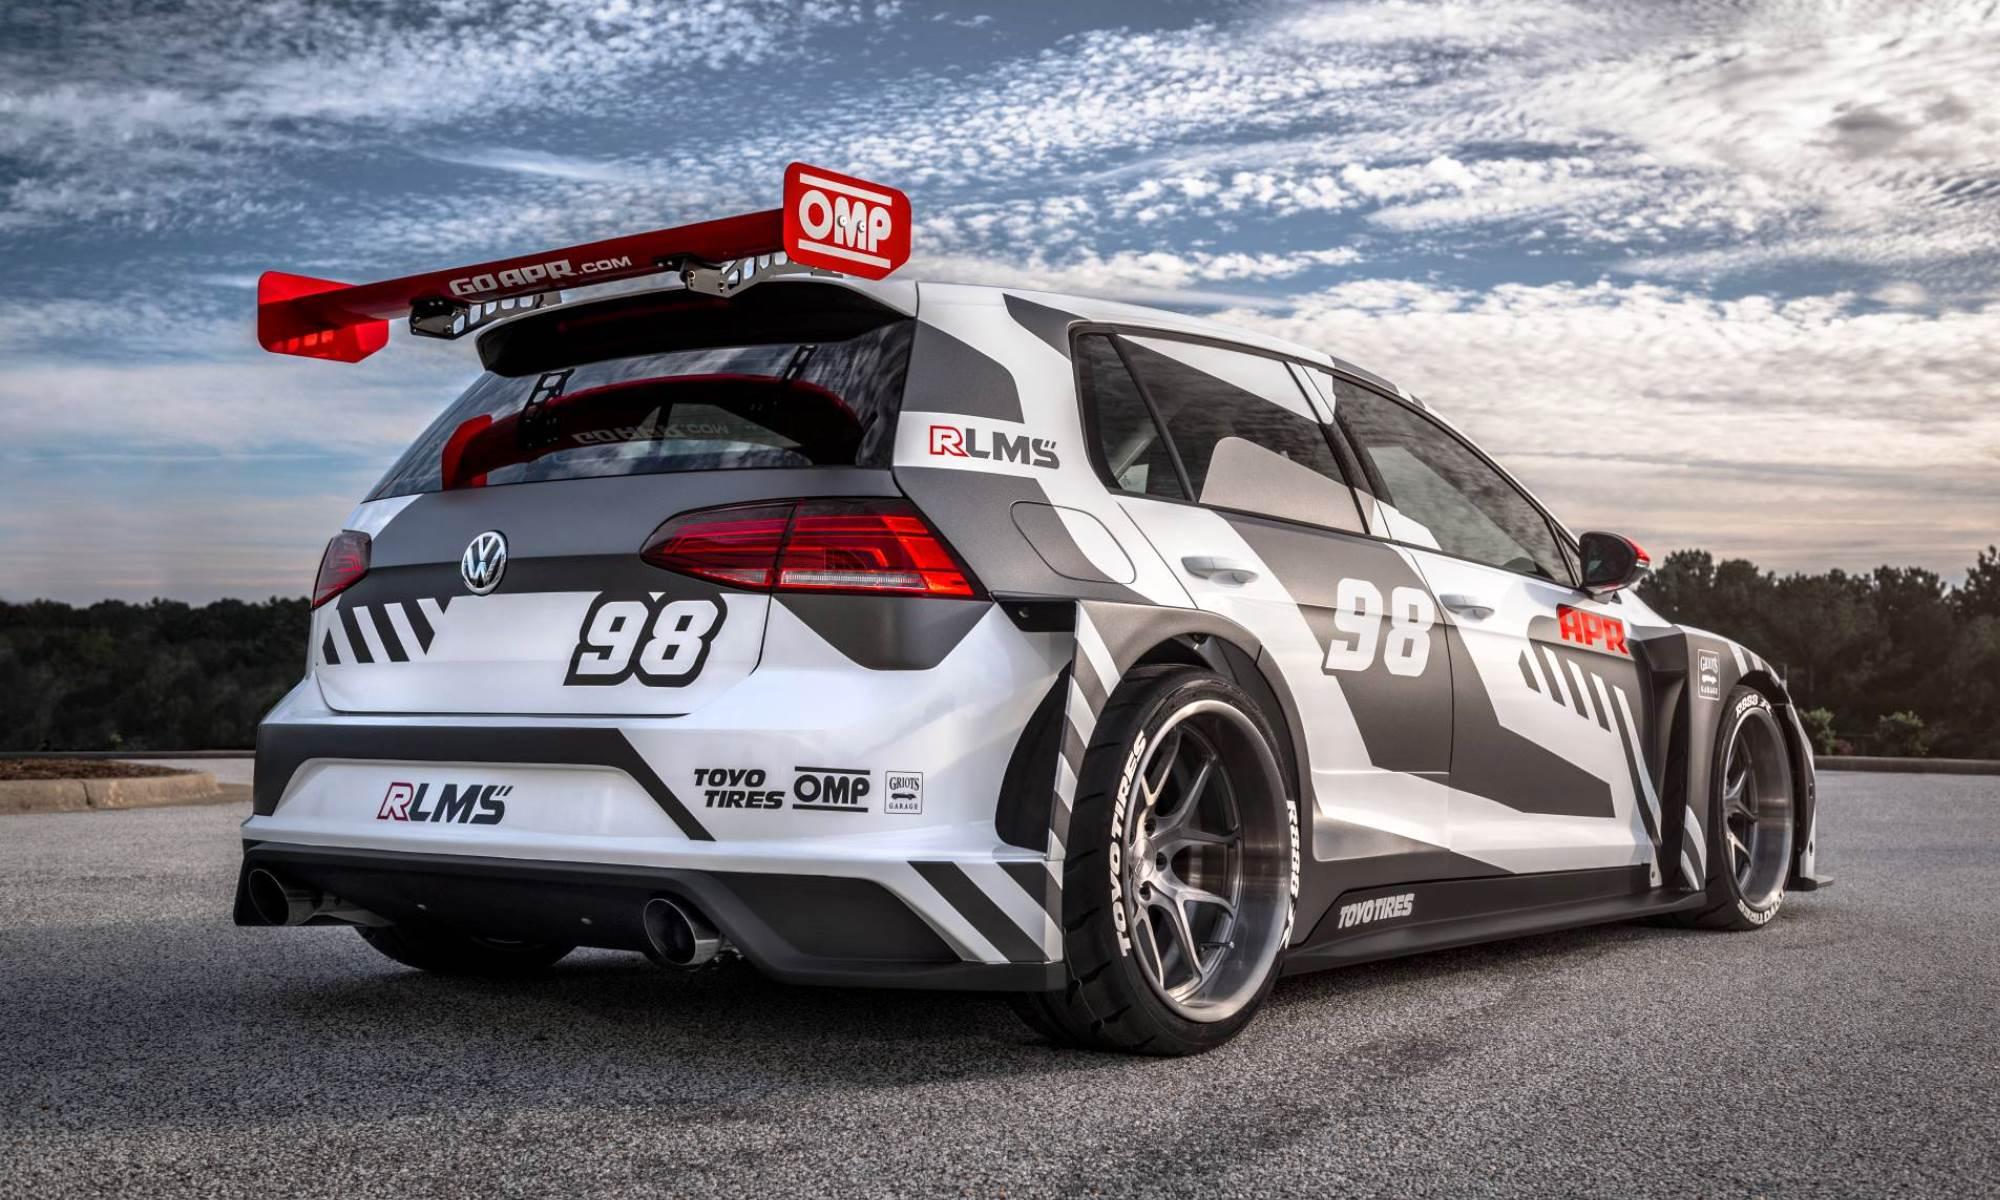 APR VW Golf RLMS rear